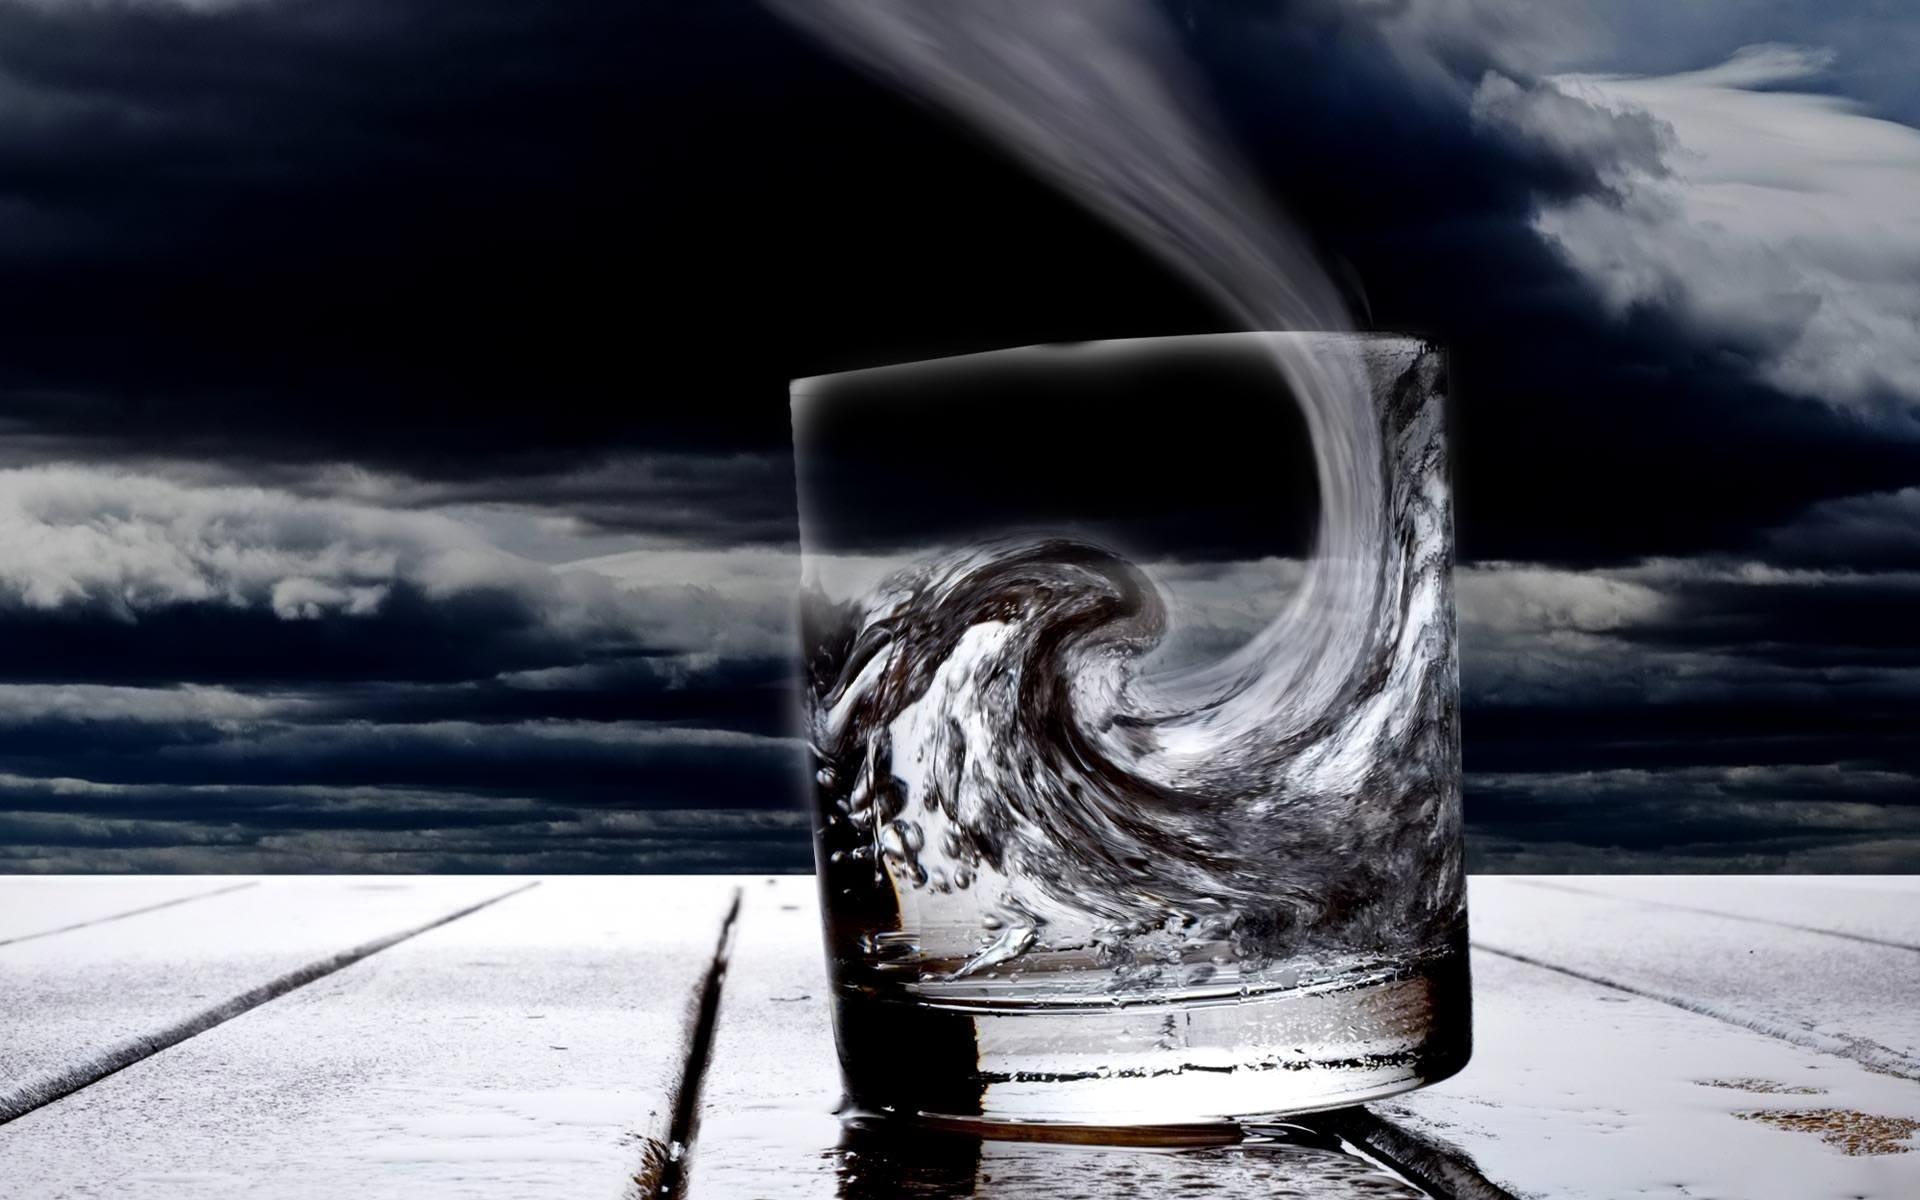 Sturm im Glas wallpapers Surrealismus / Surrealismus